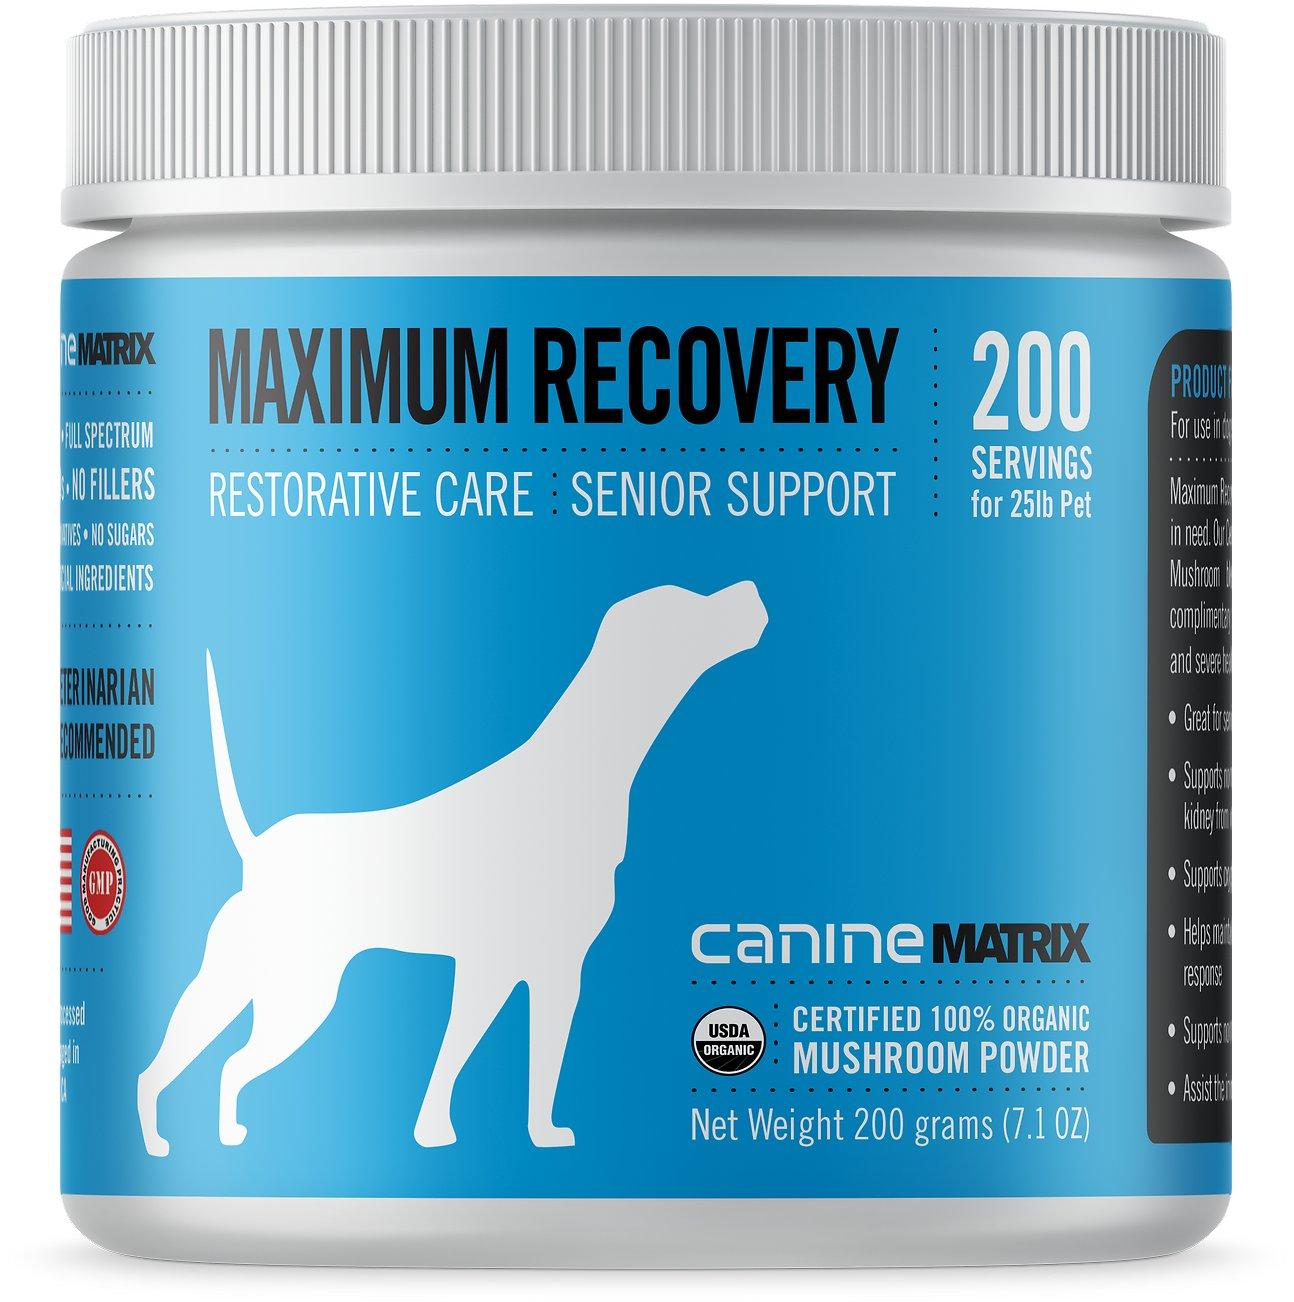 Canine Matrix Maximum Recovery Restorative Care Senior Support Dog Supplement, 200-g